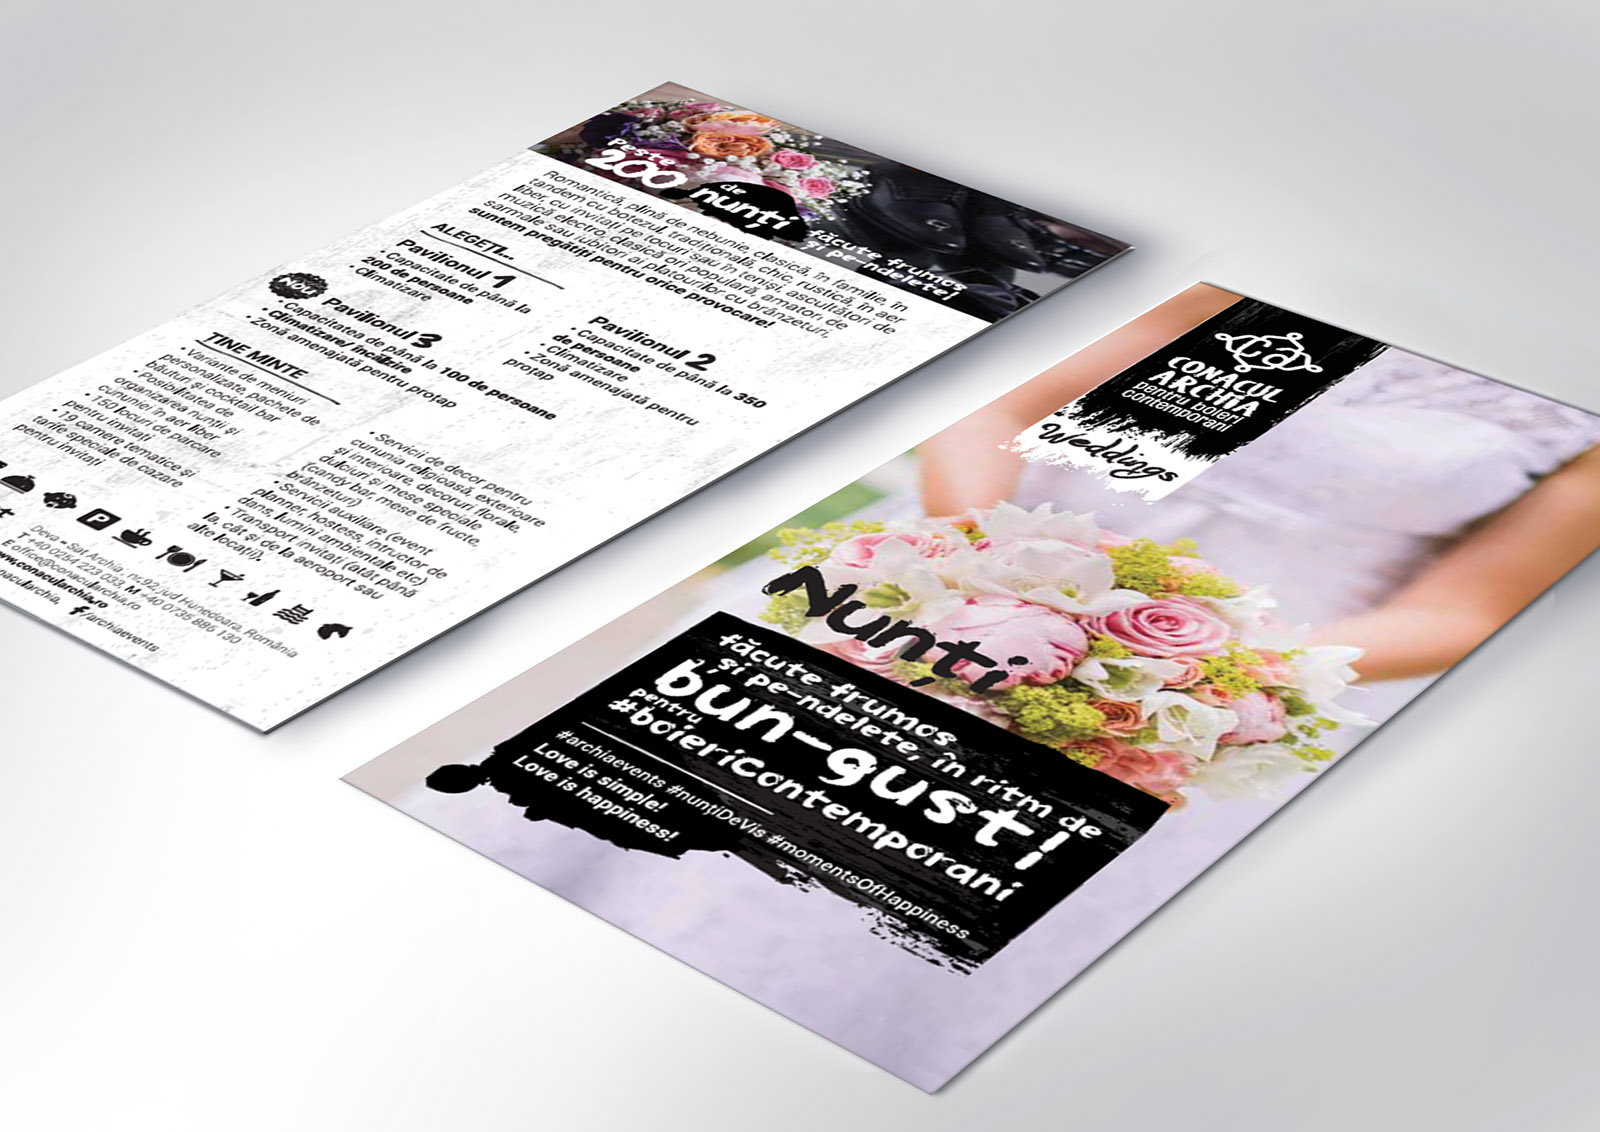 conacul archia portofoliu inoveo flyer